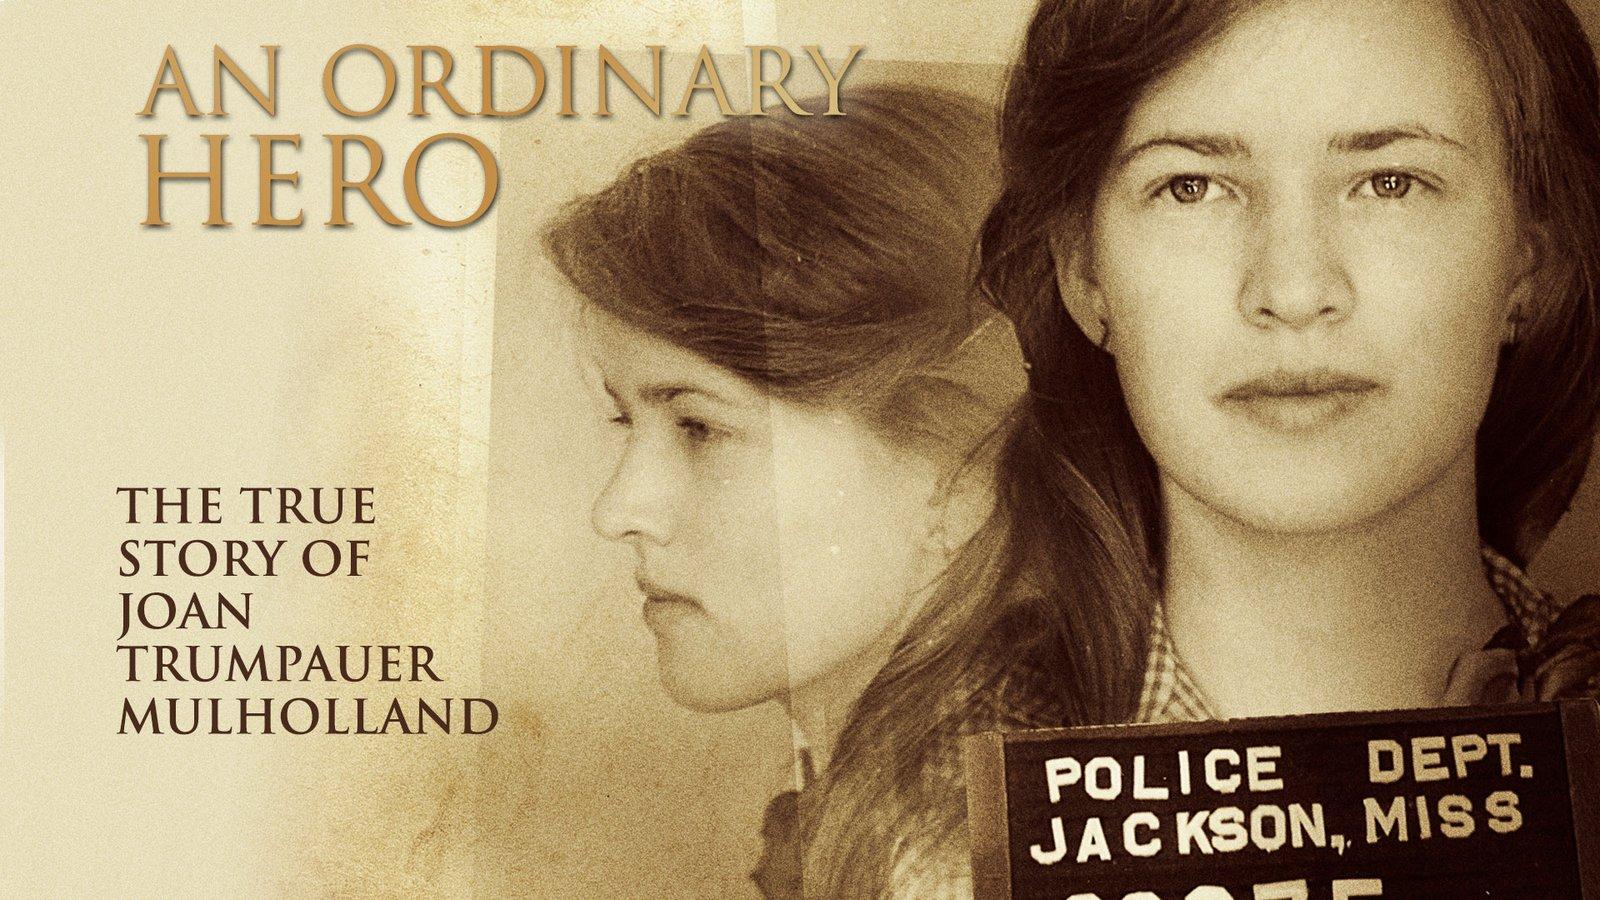 An Ordinary Hero - The True Story of Civil Rights Activist Joan Trumpauer Mulholland